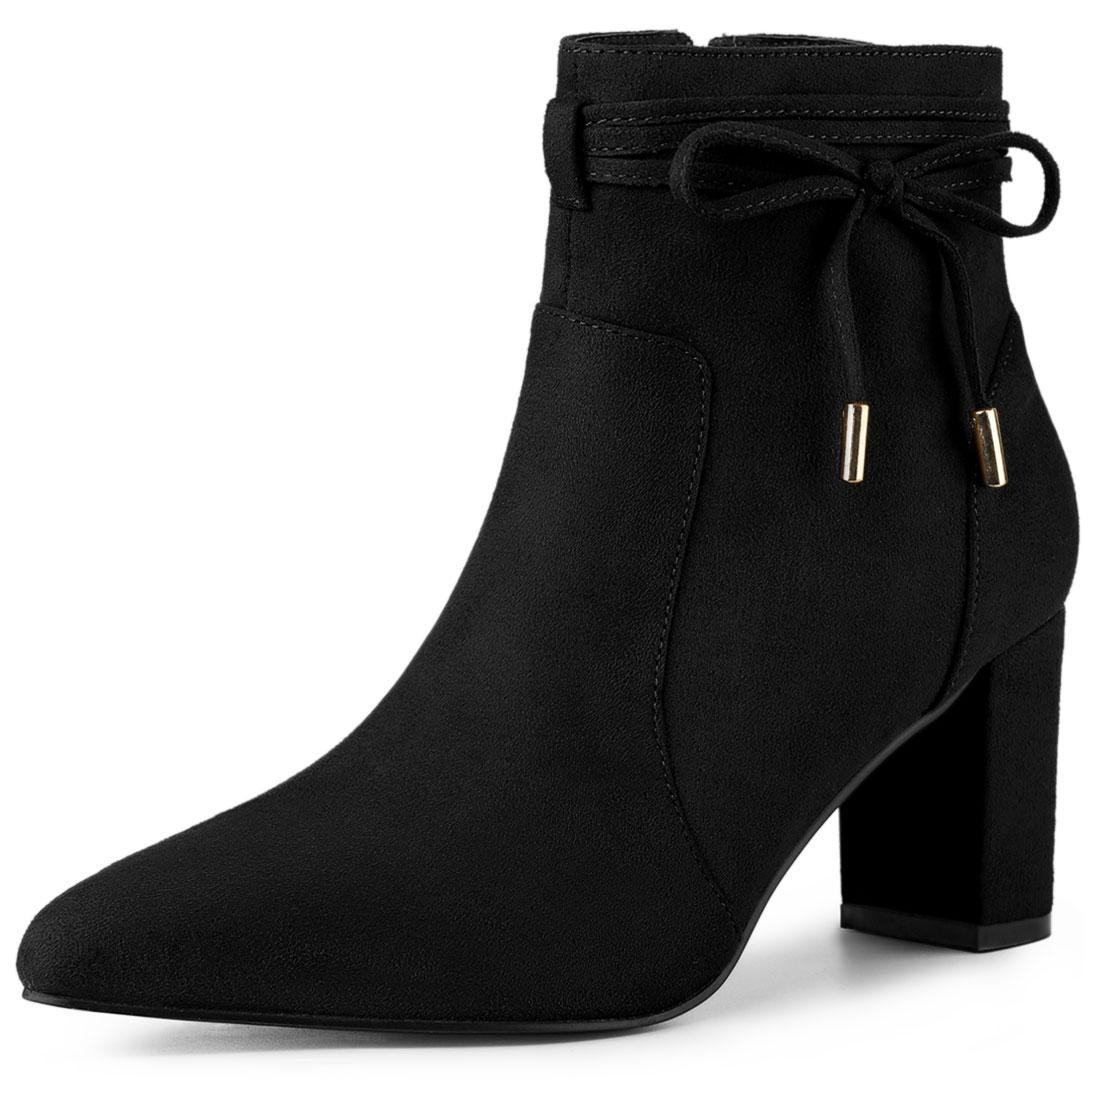 Allegra K Women's Pointed Toe Block Heel Zipper Ankle Boots Black US 7